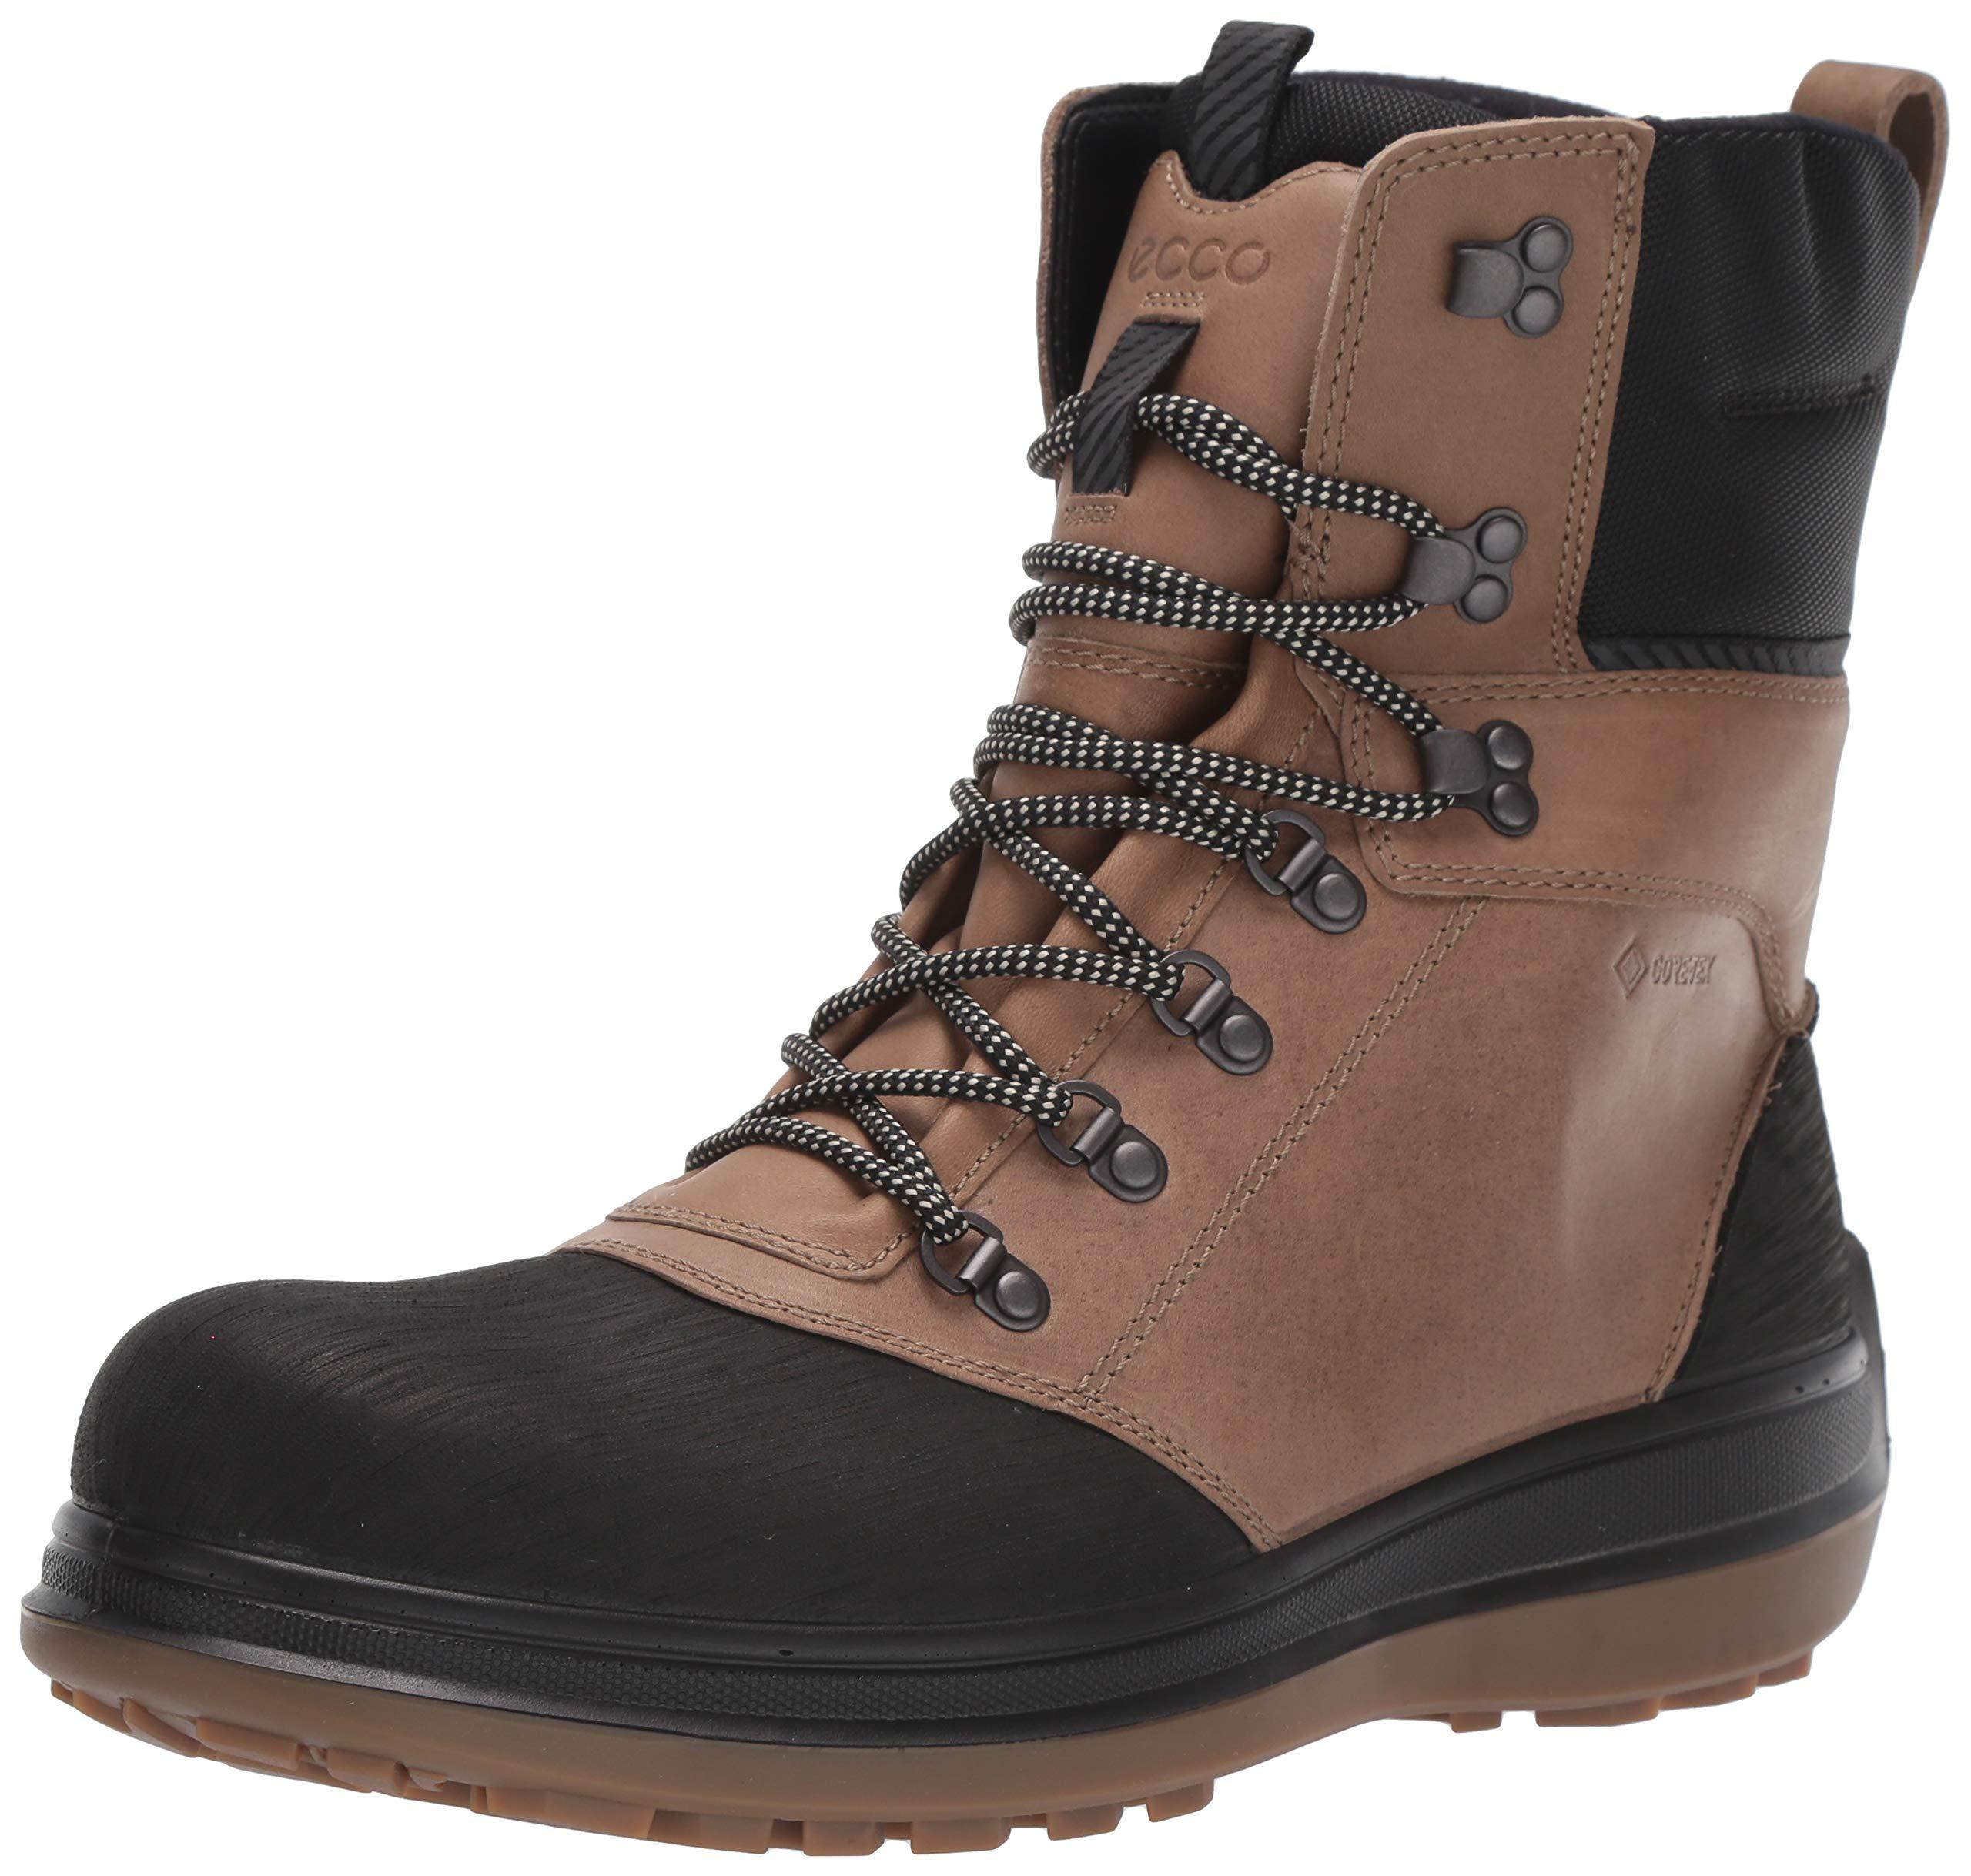 ECCO Men's Roxton Winter Gore-Tex Snow Boot, Black/Navajo Brown/Primaloft G, 45 M EU (11-11.5 US) by ECCO